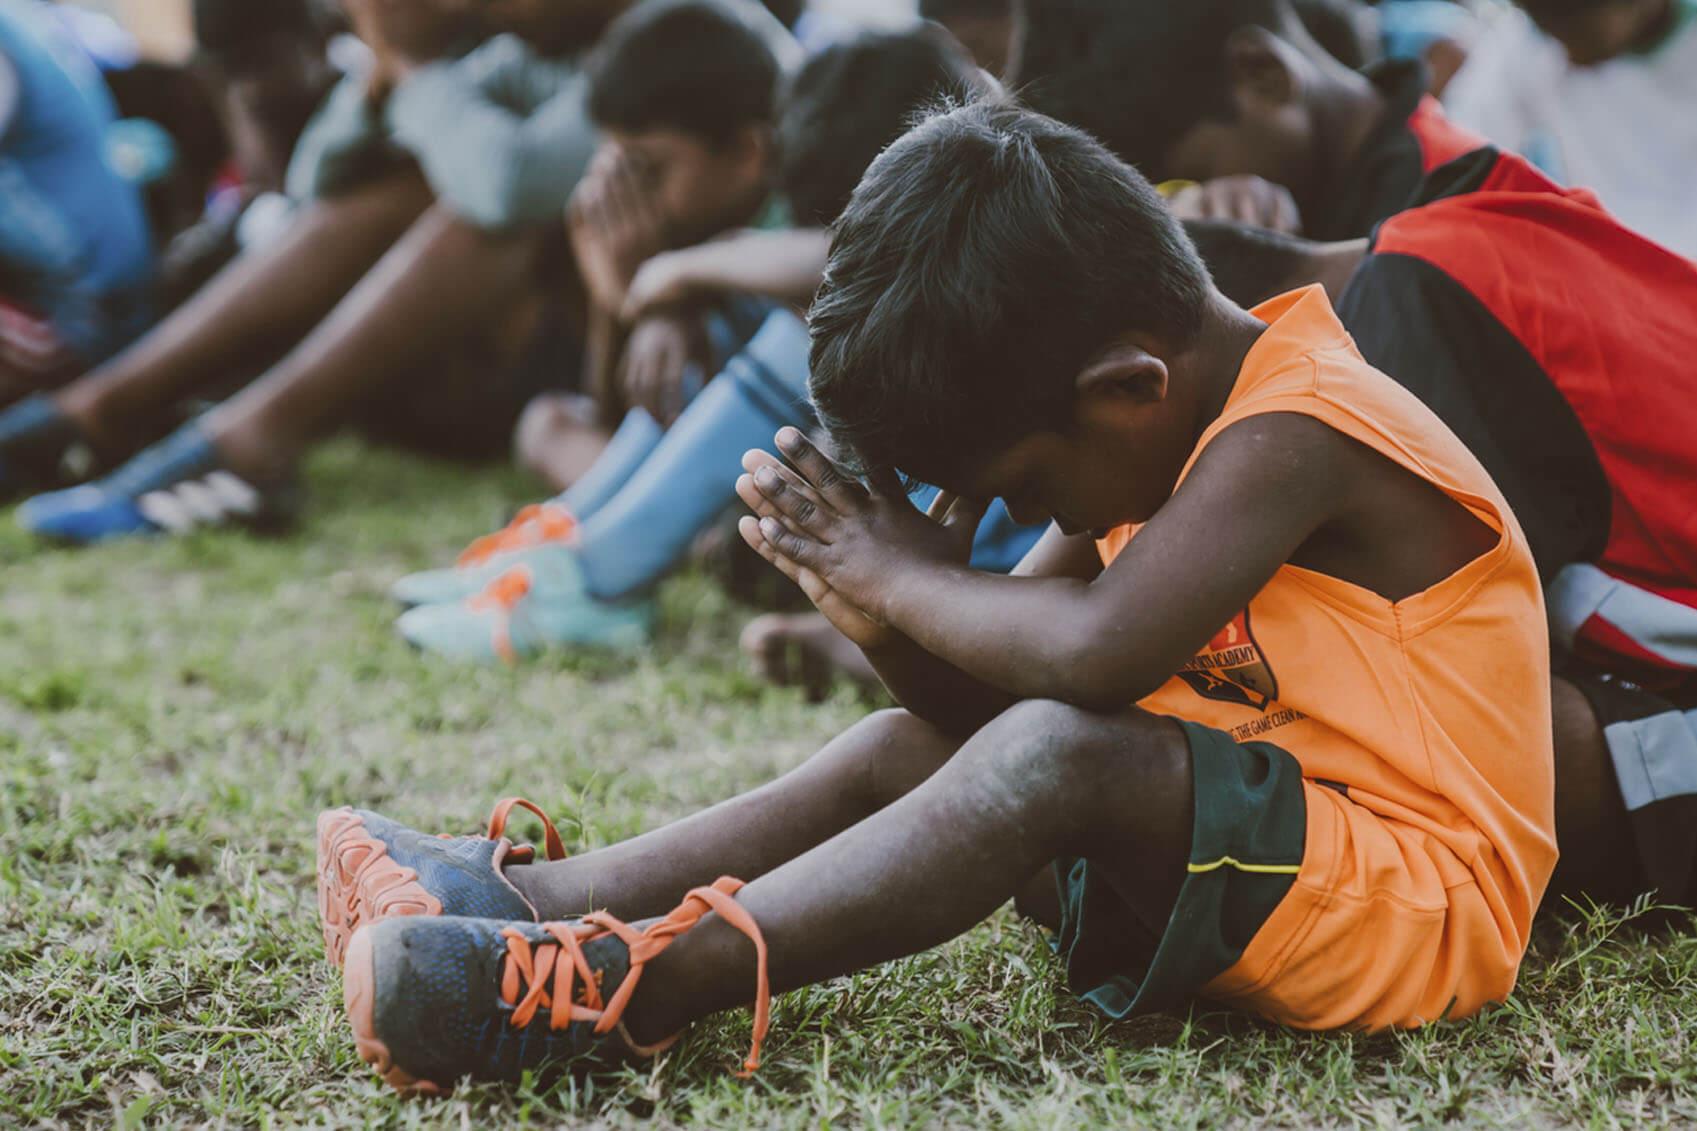 Young boy praying on football field